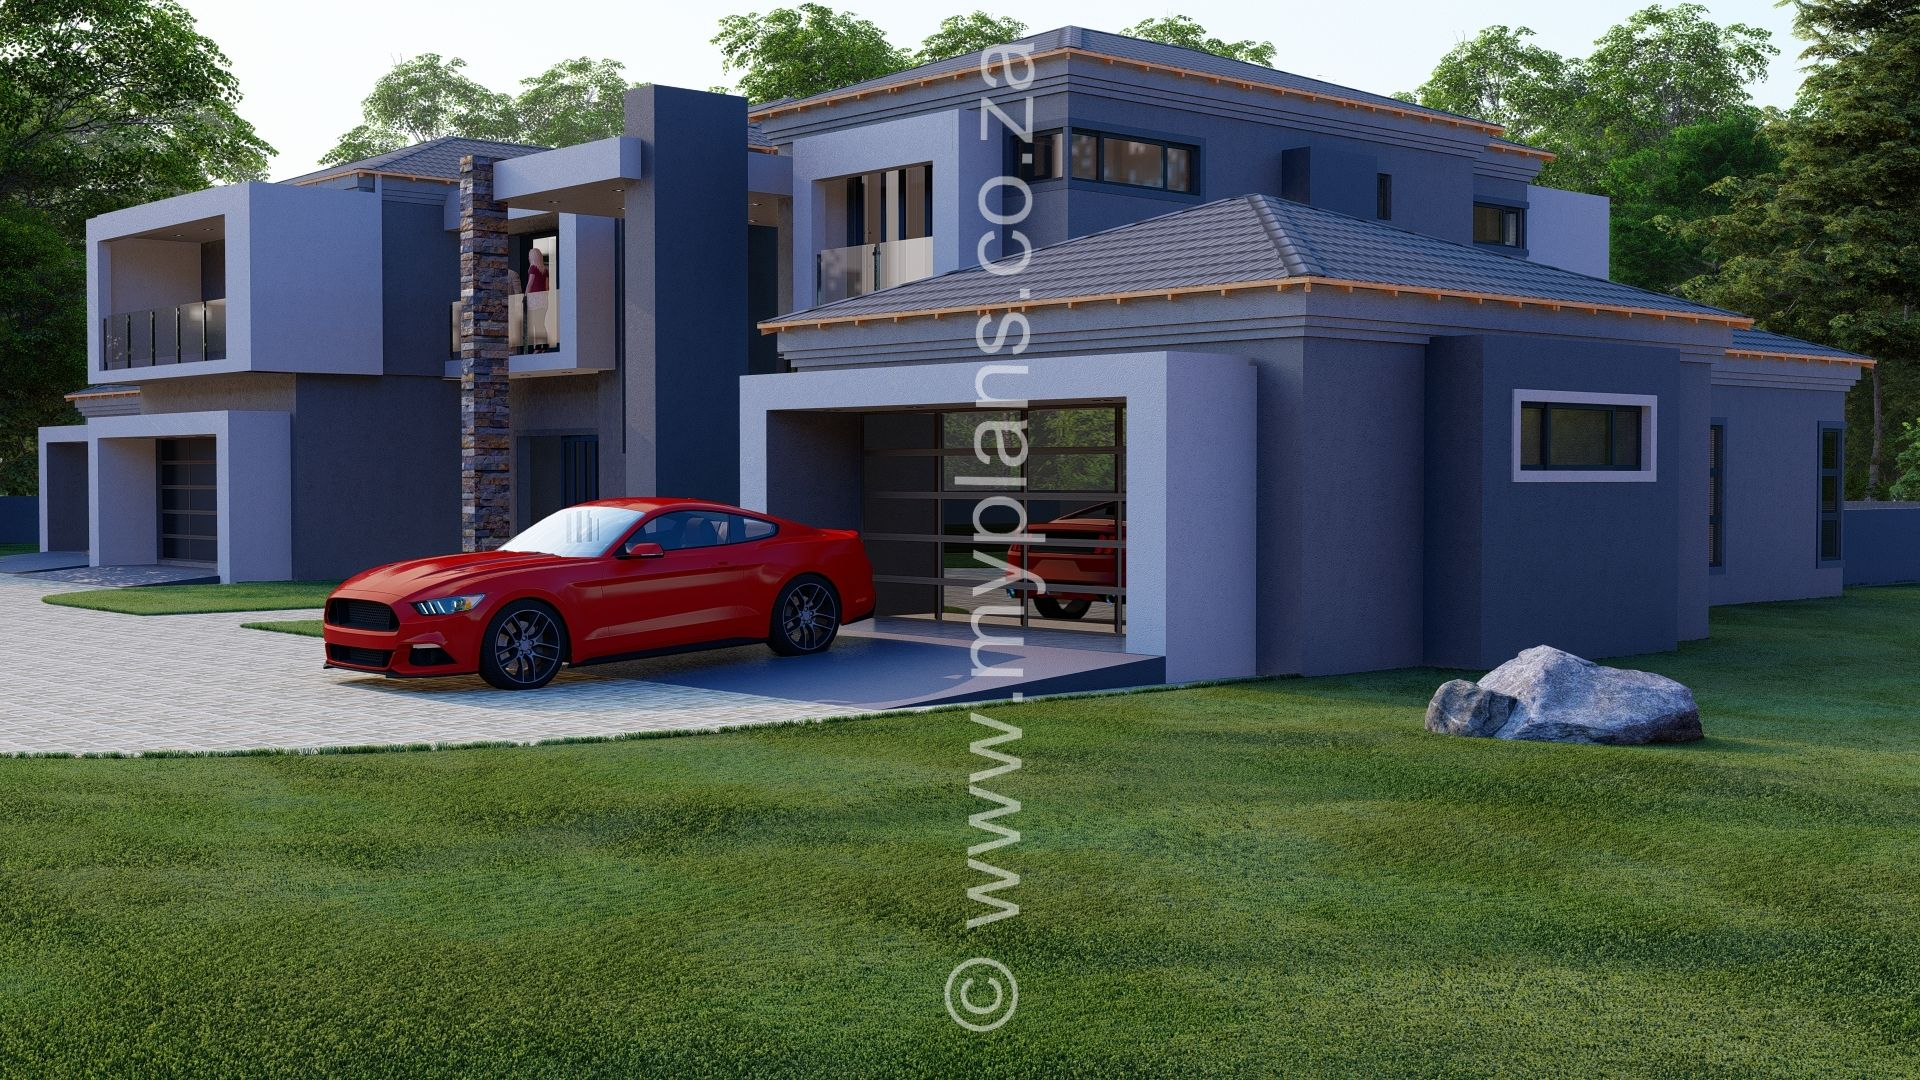 6 Bedroom House Plan Mlb N01 House Plans South Africa 6 Bedroom House Plans Bedroom House Plans